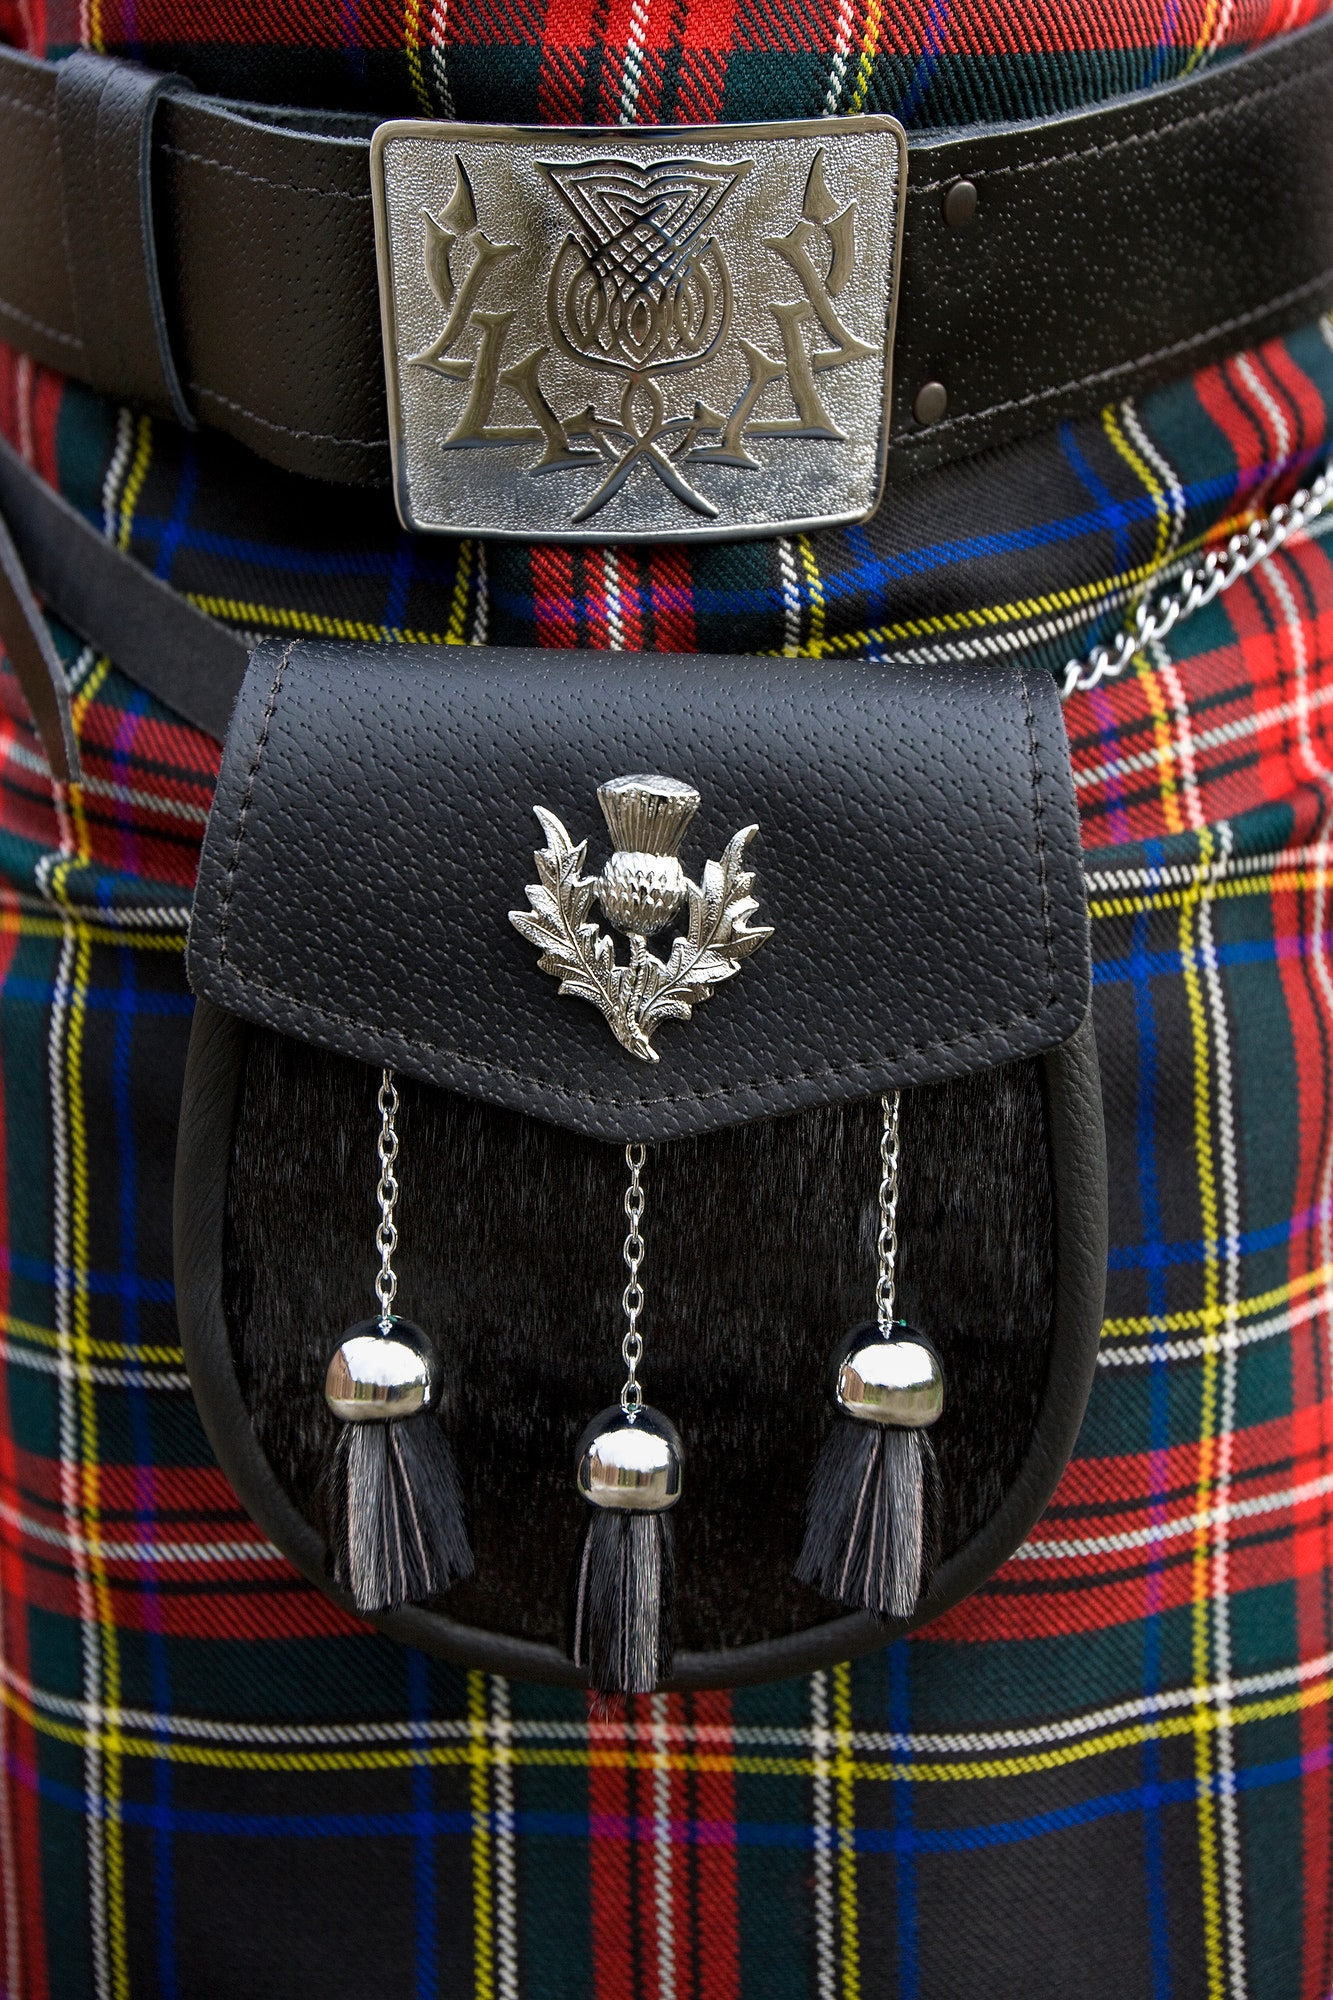 Scotland - Scottish sporran and tartan kilt.